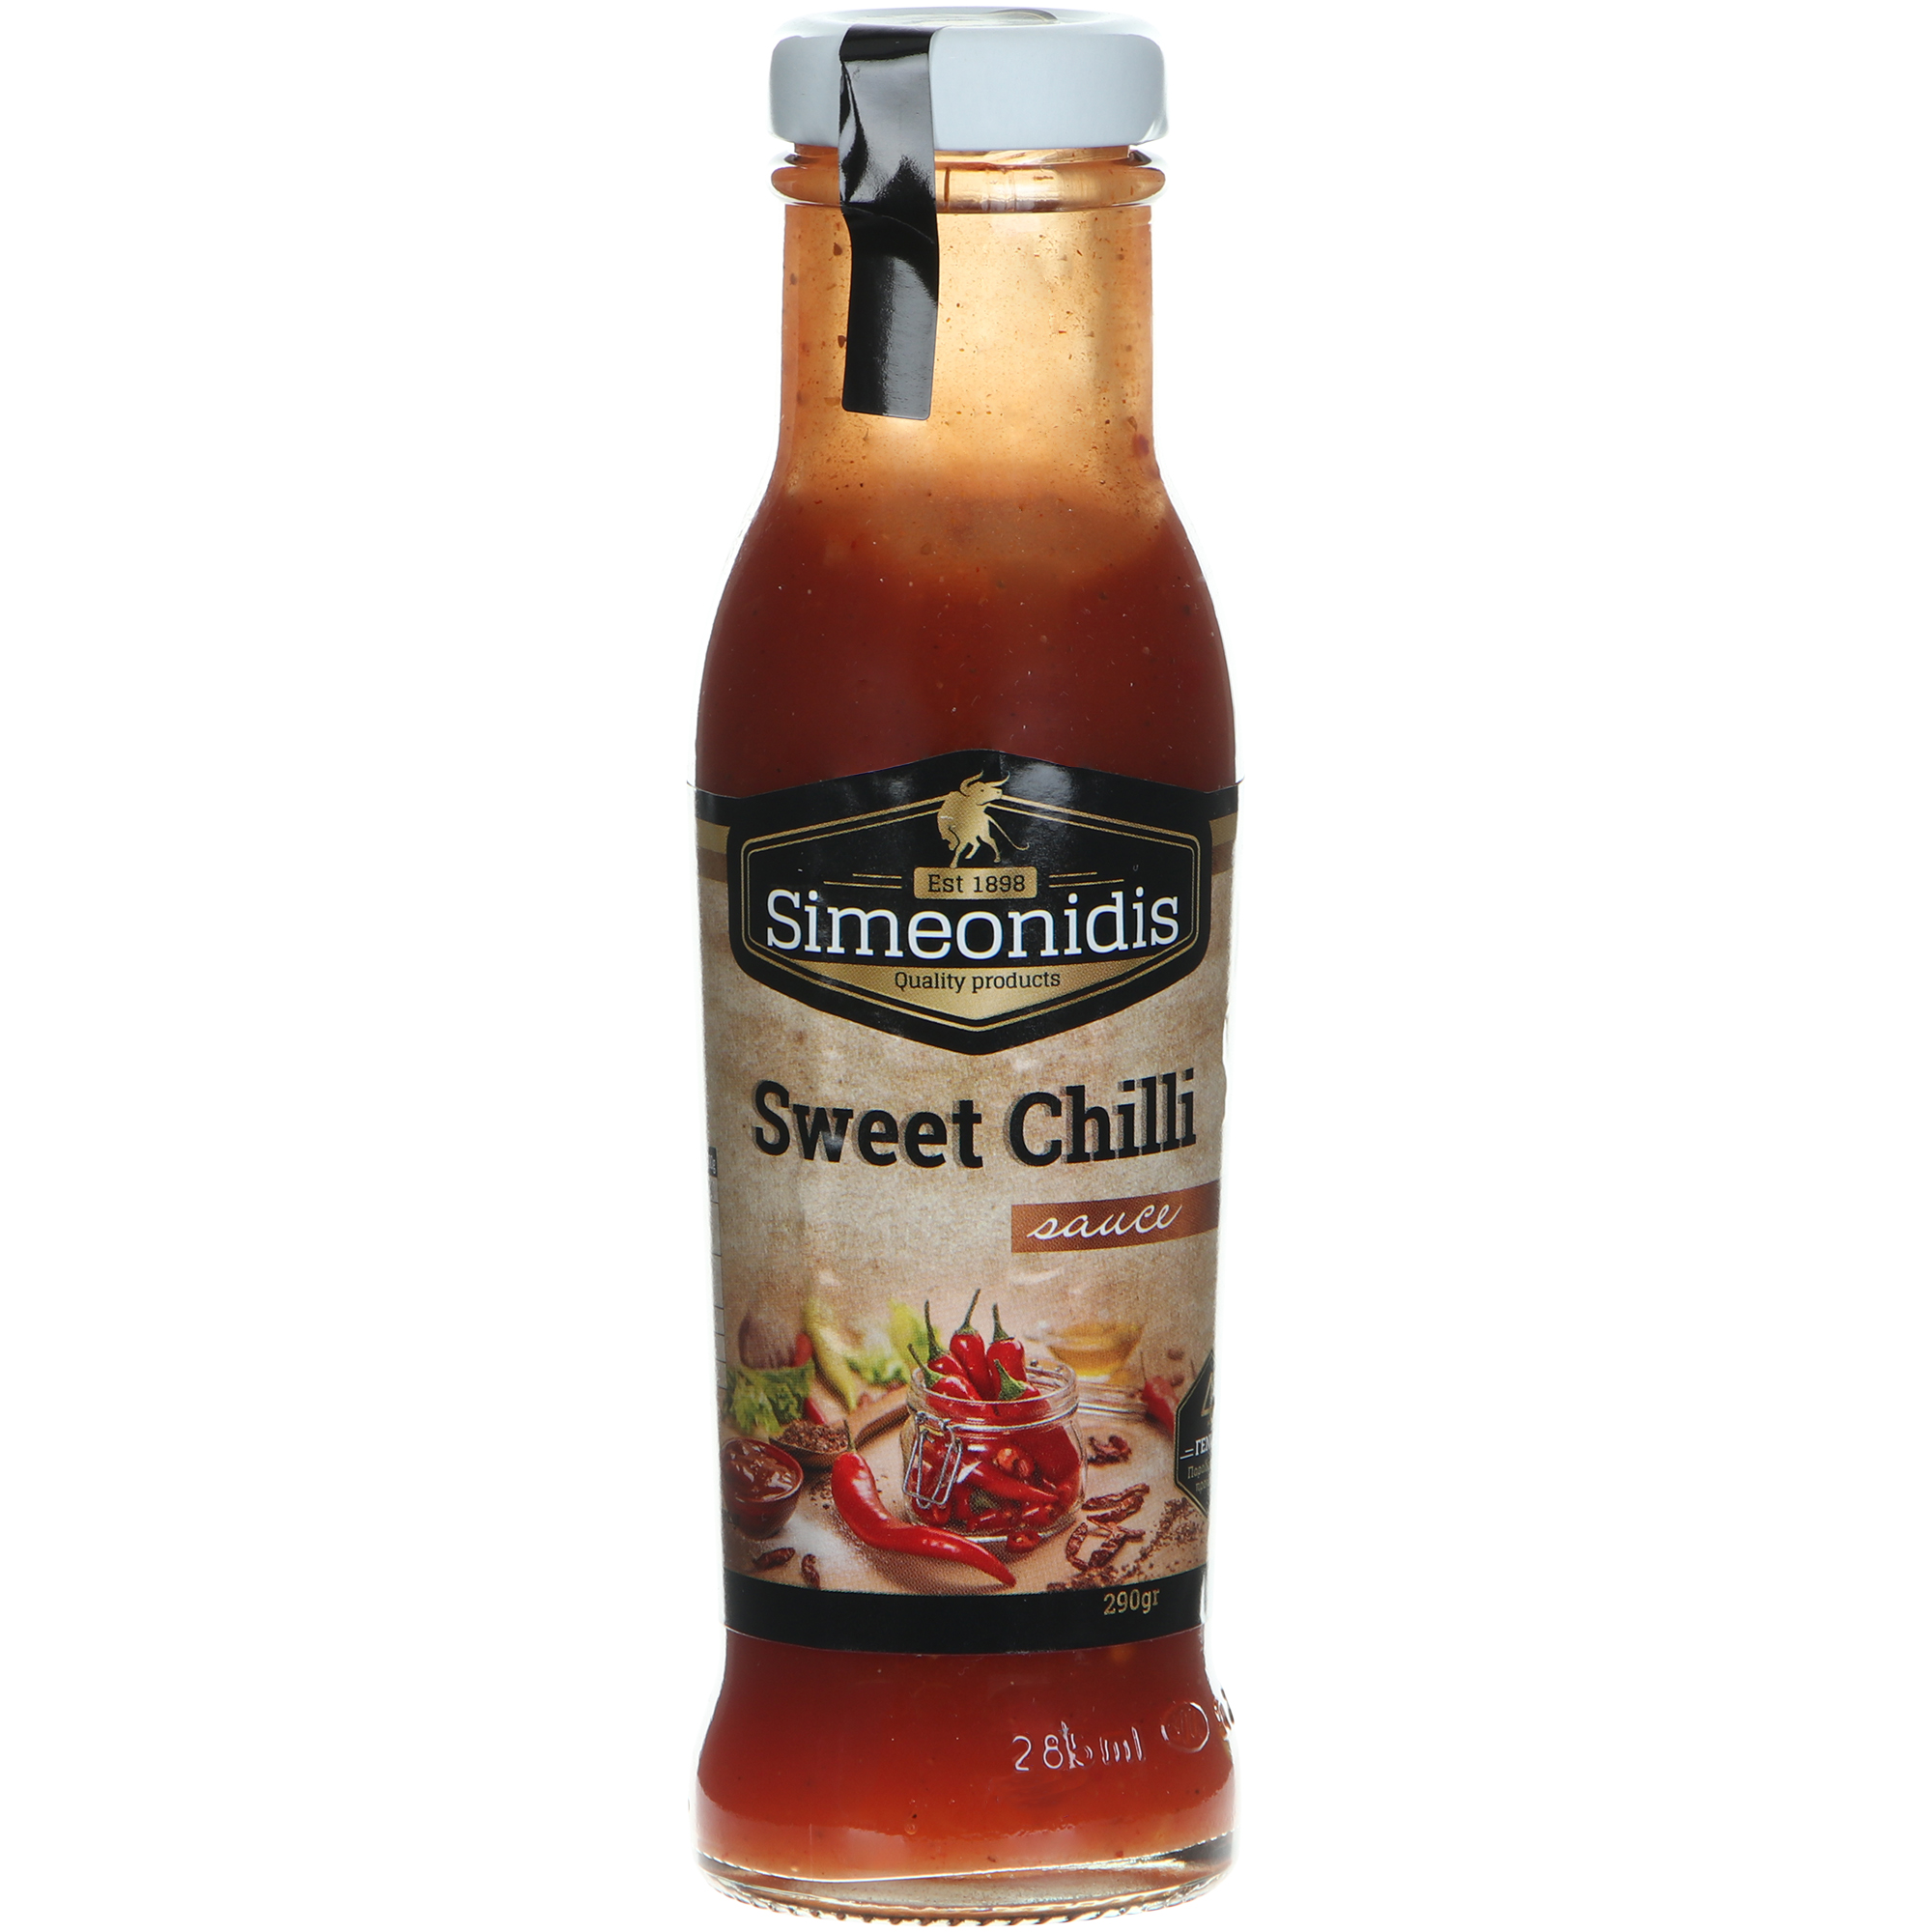 Соус Simeonidis сладкий чили, 290 г соус чили simeonidis 290 г